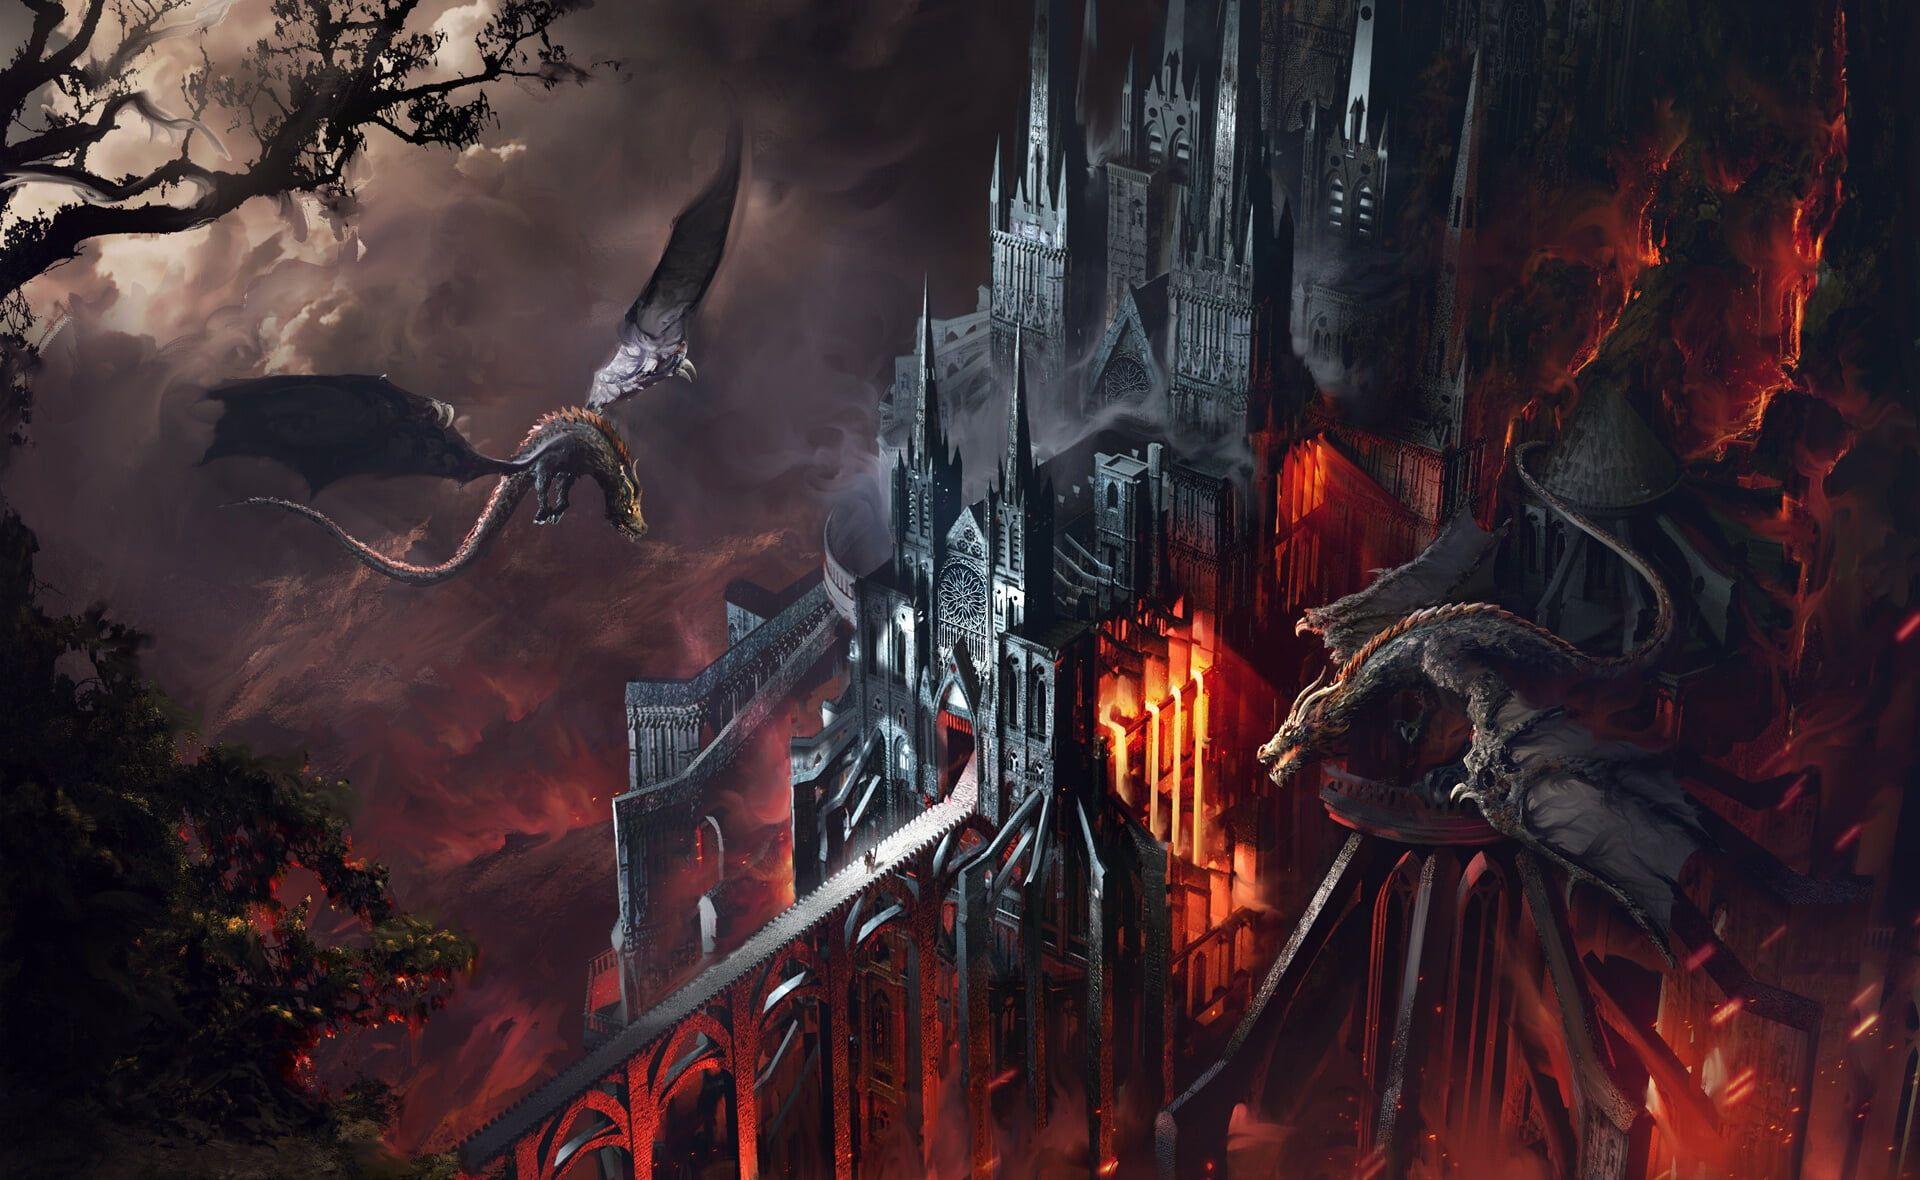 Fantasy Dragon Castle 1080p Wallpaper Hdwallpaper Desktop In 2020 Hd Wallpaper Dragon Fantasy